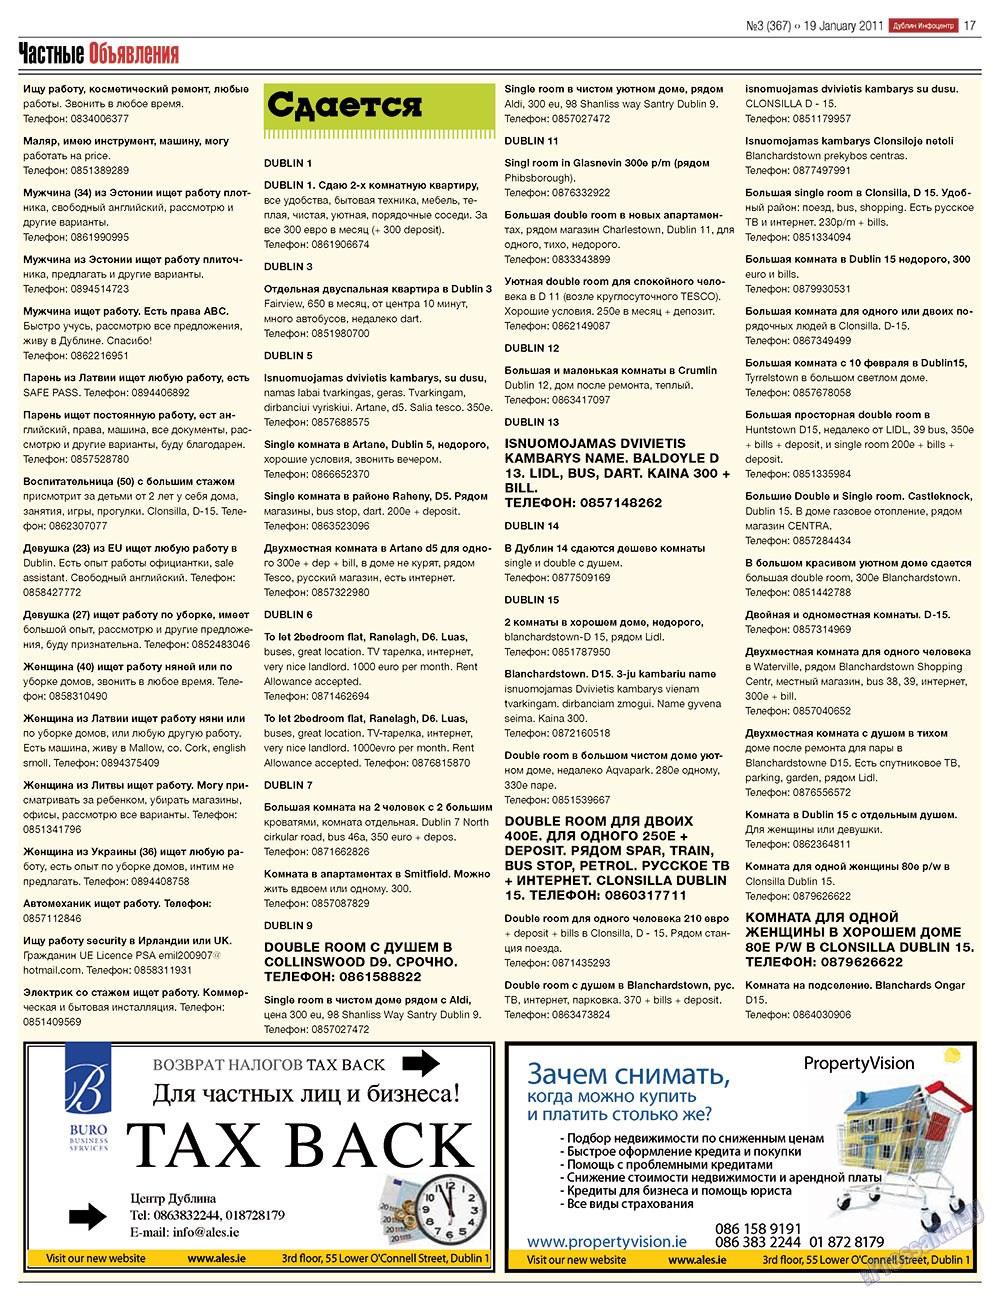 Дублин инфоцентр (газета). 2011 год, номер 3, стр. 17